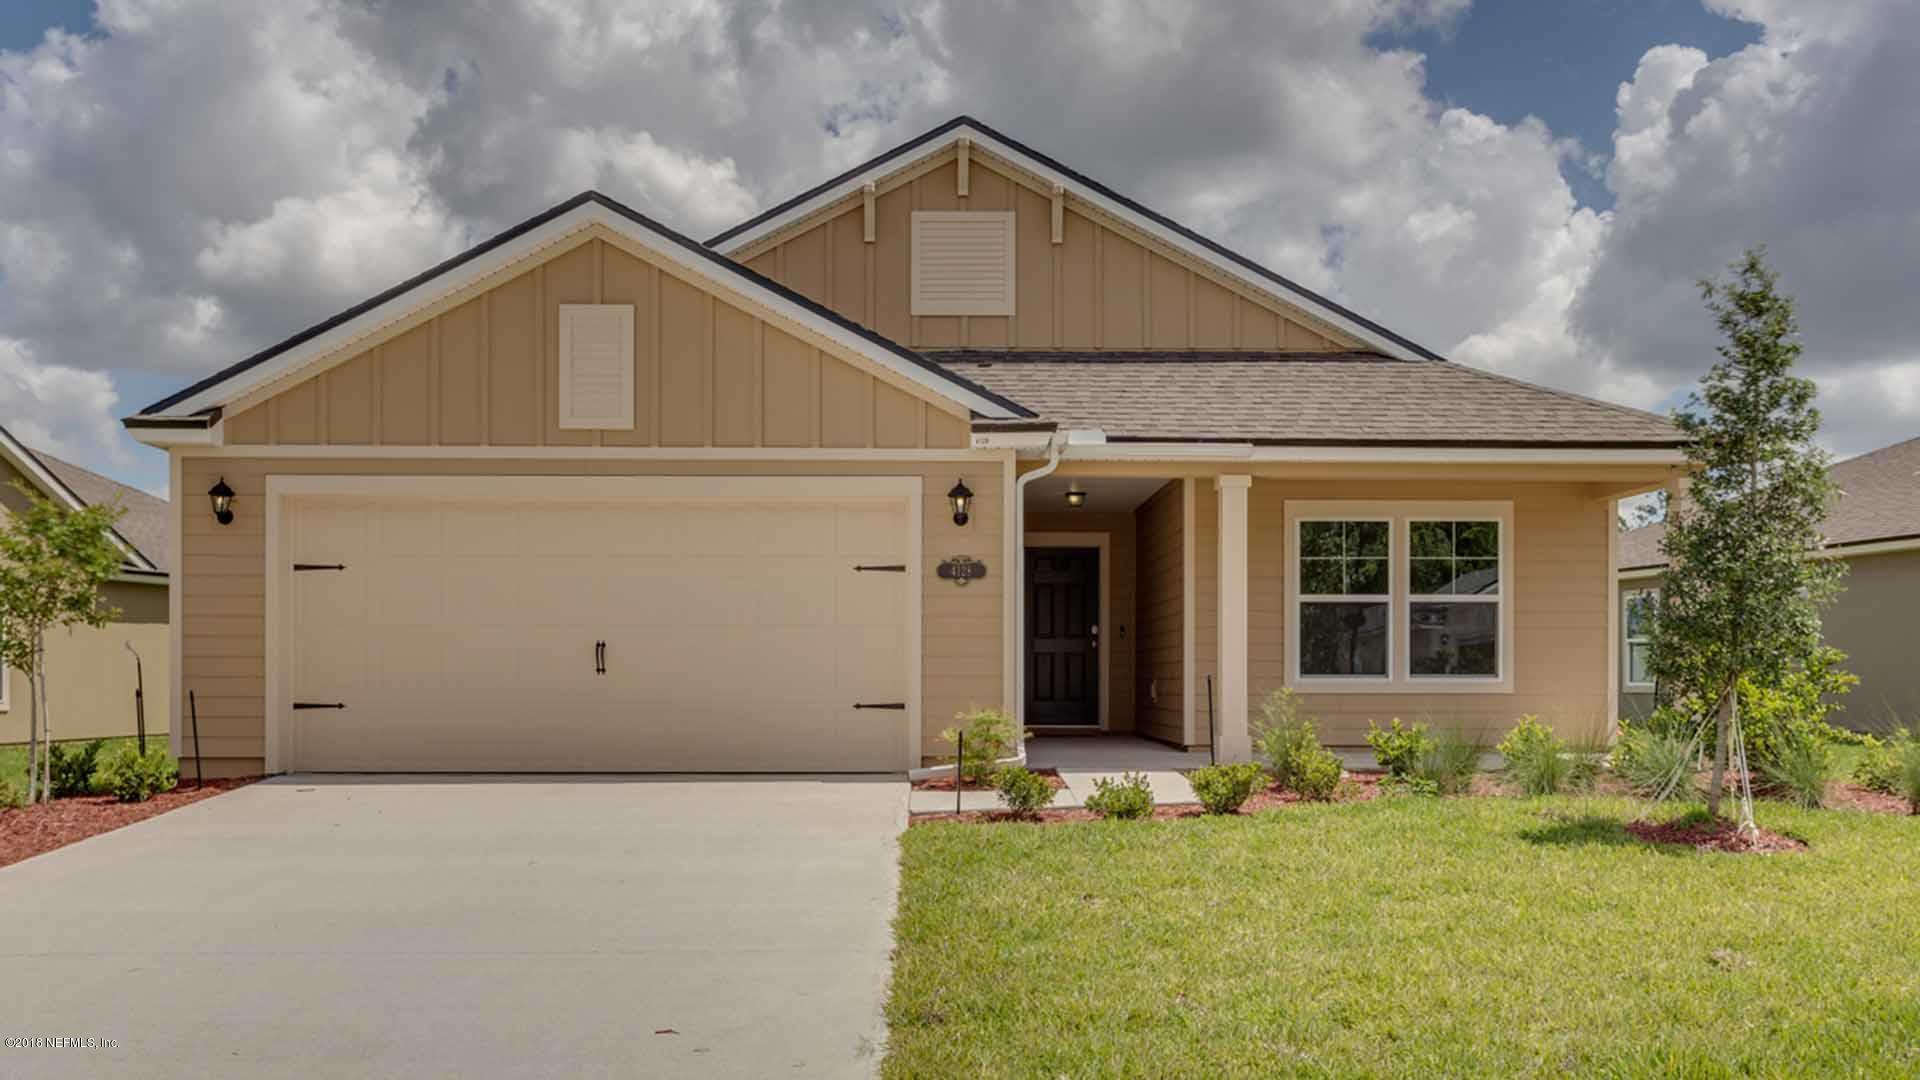 4128 SPRING CREEK, MIDDLEBURG, FLORIDA 32068, 3 Bedrooms Bedrooms, ,2 BathroomsBathrooms,Residential - single family,For sale,SPRING CREEK,906574